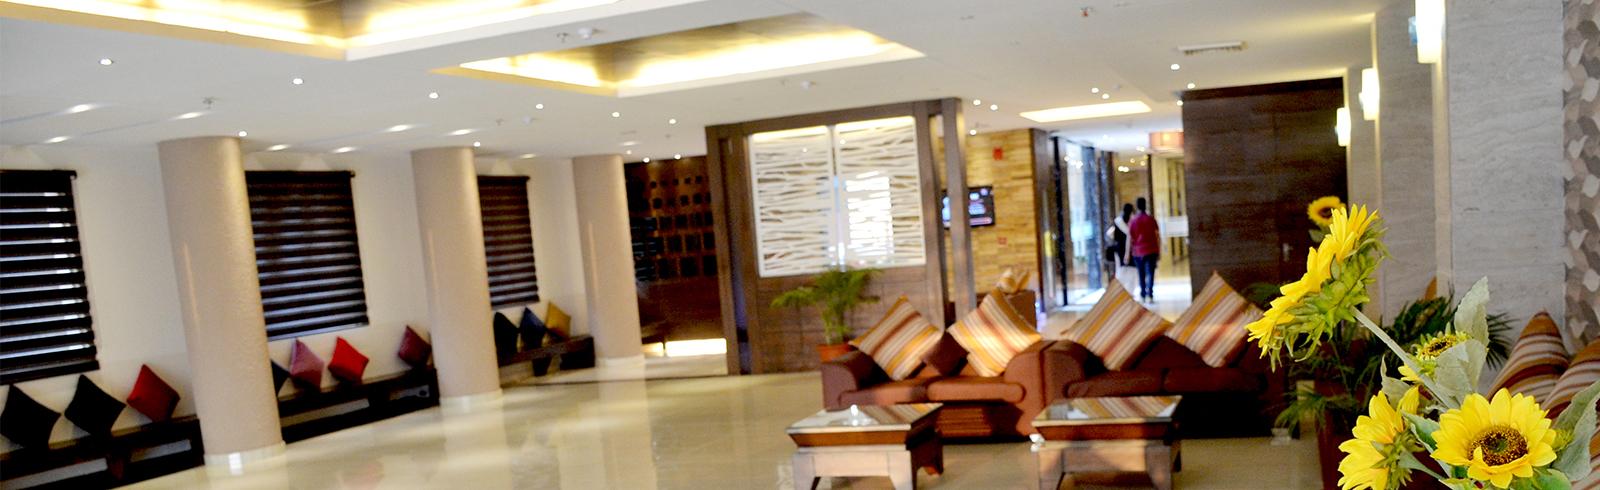 Lobby Hotel Sapphire